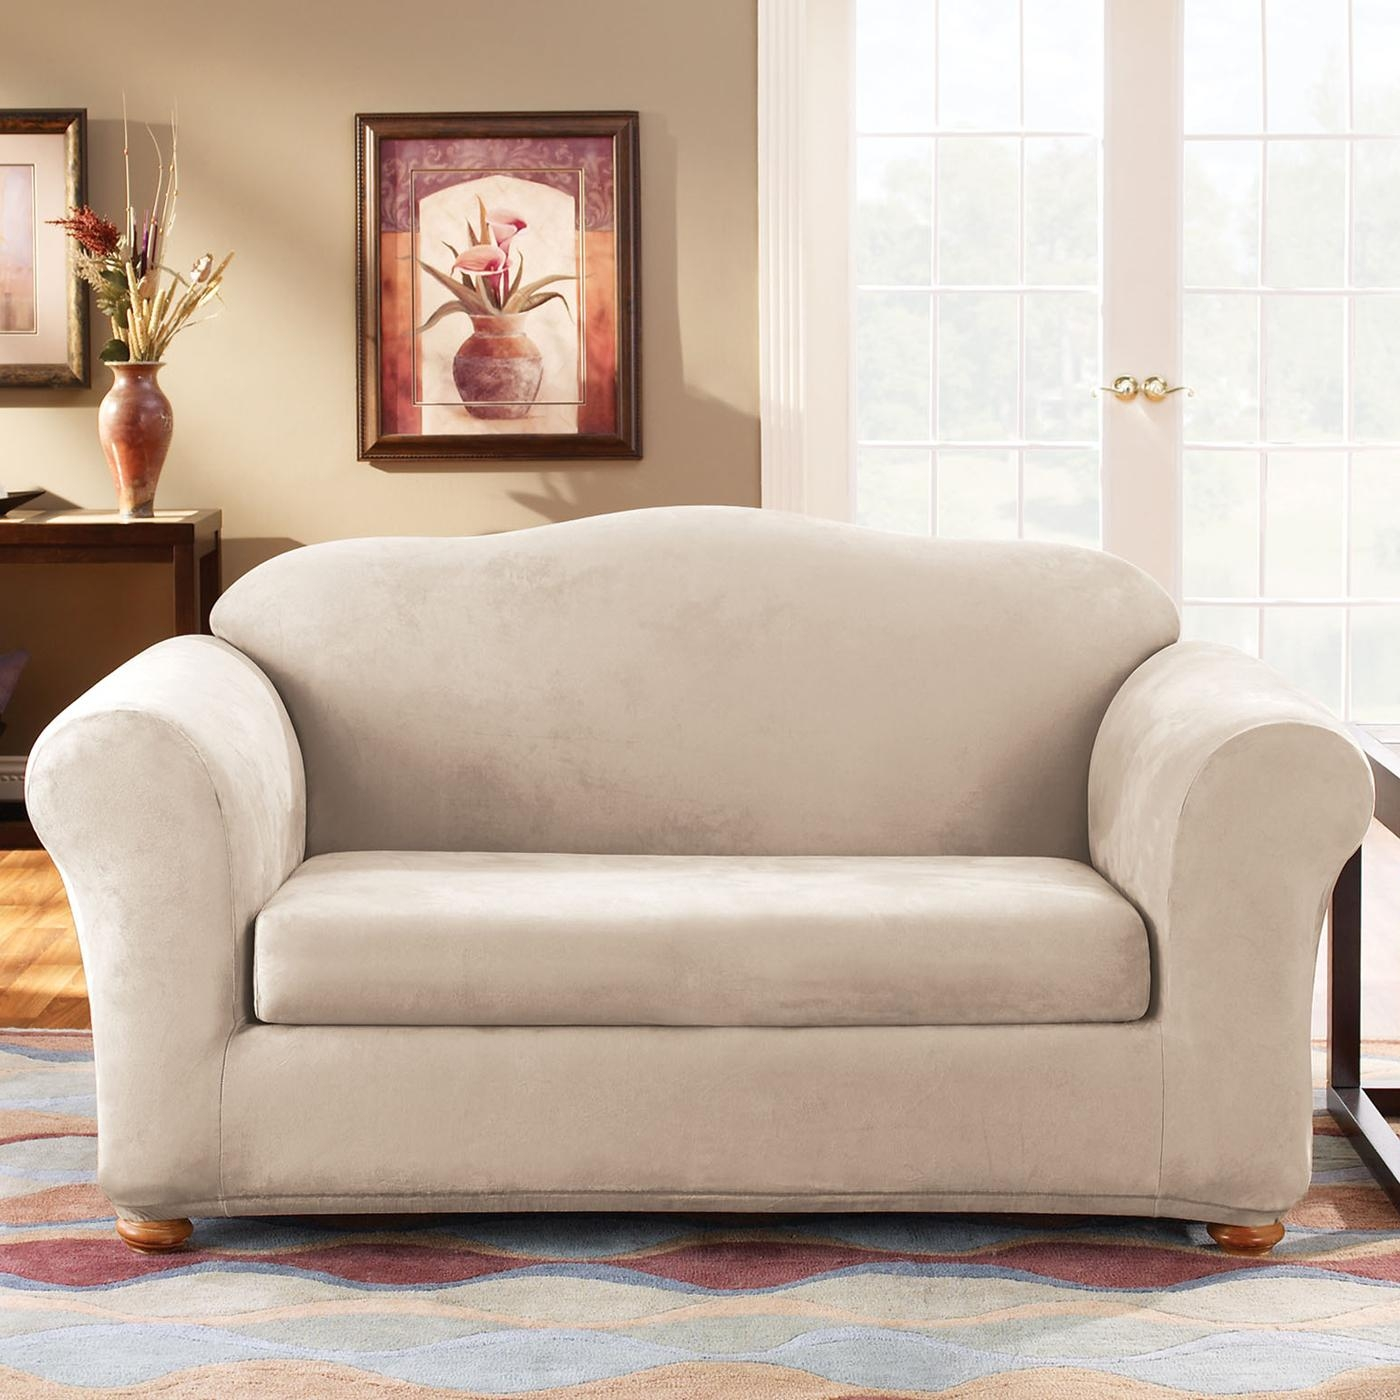 Living Room : Slipcovered Sleeper Sofa Slipcover Slipcovers For Inside 2 Piece Sofa Covers (Image 11 of 27)